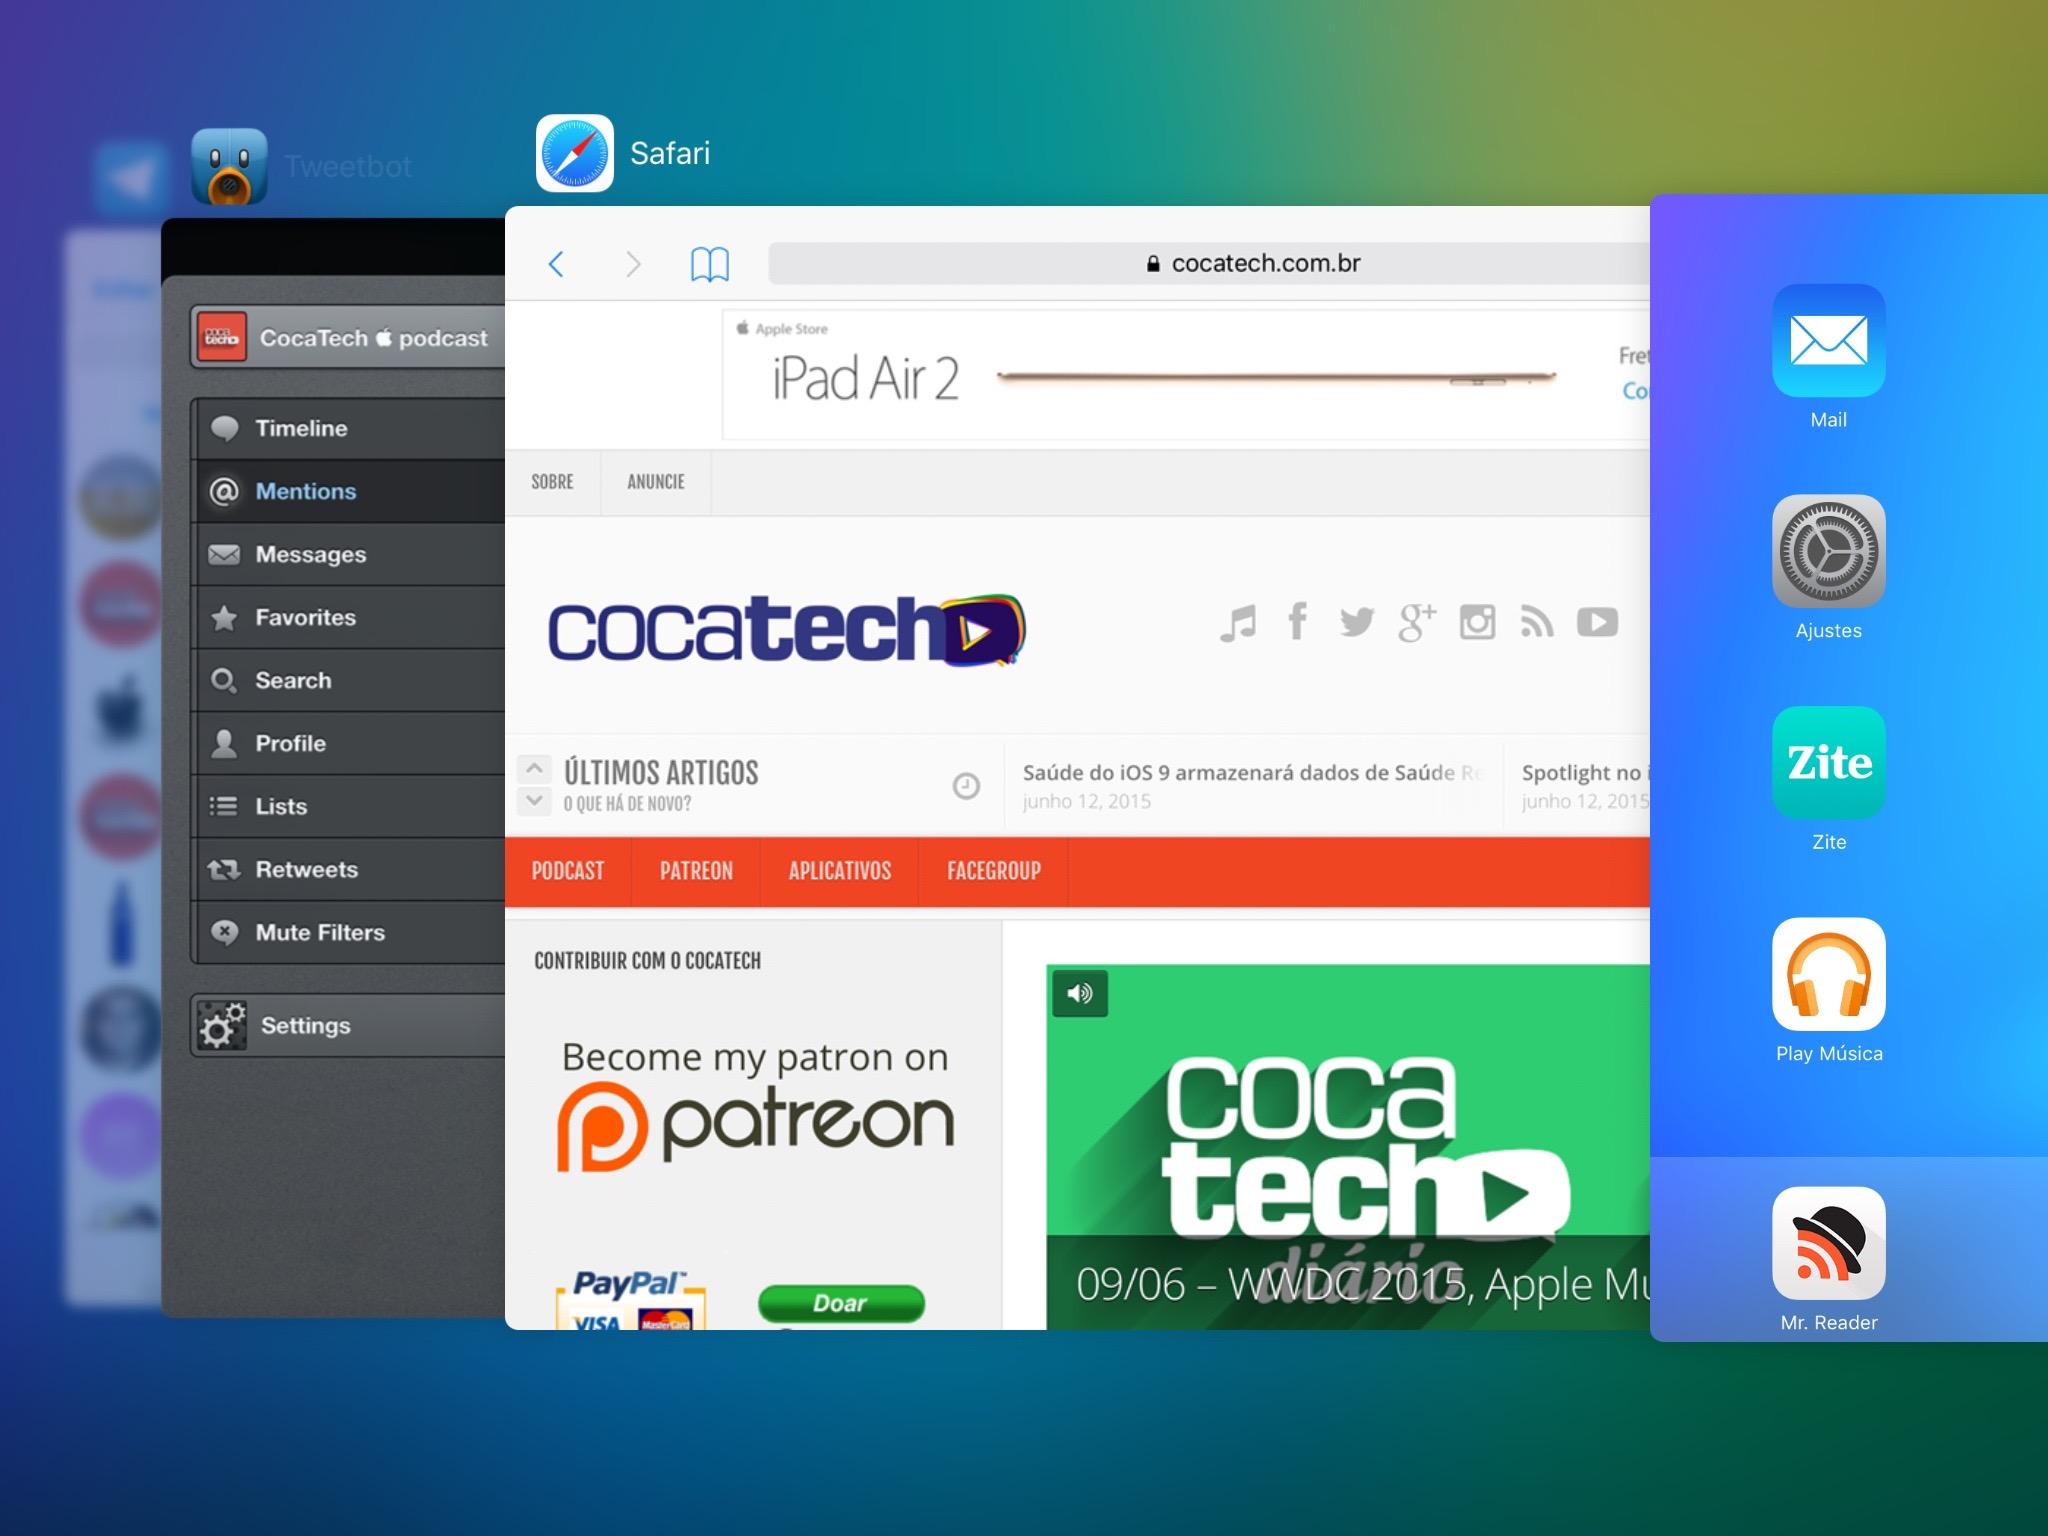 ios-9-trara-novo-layout-de-multitarefa-ipad